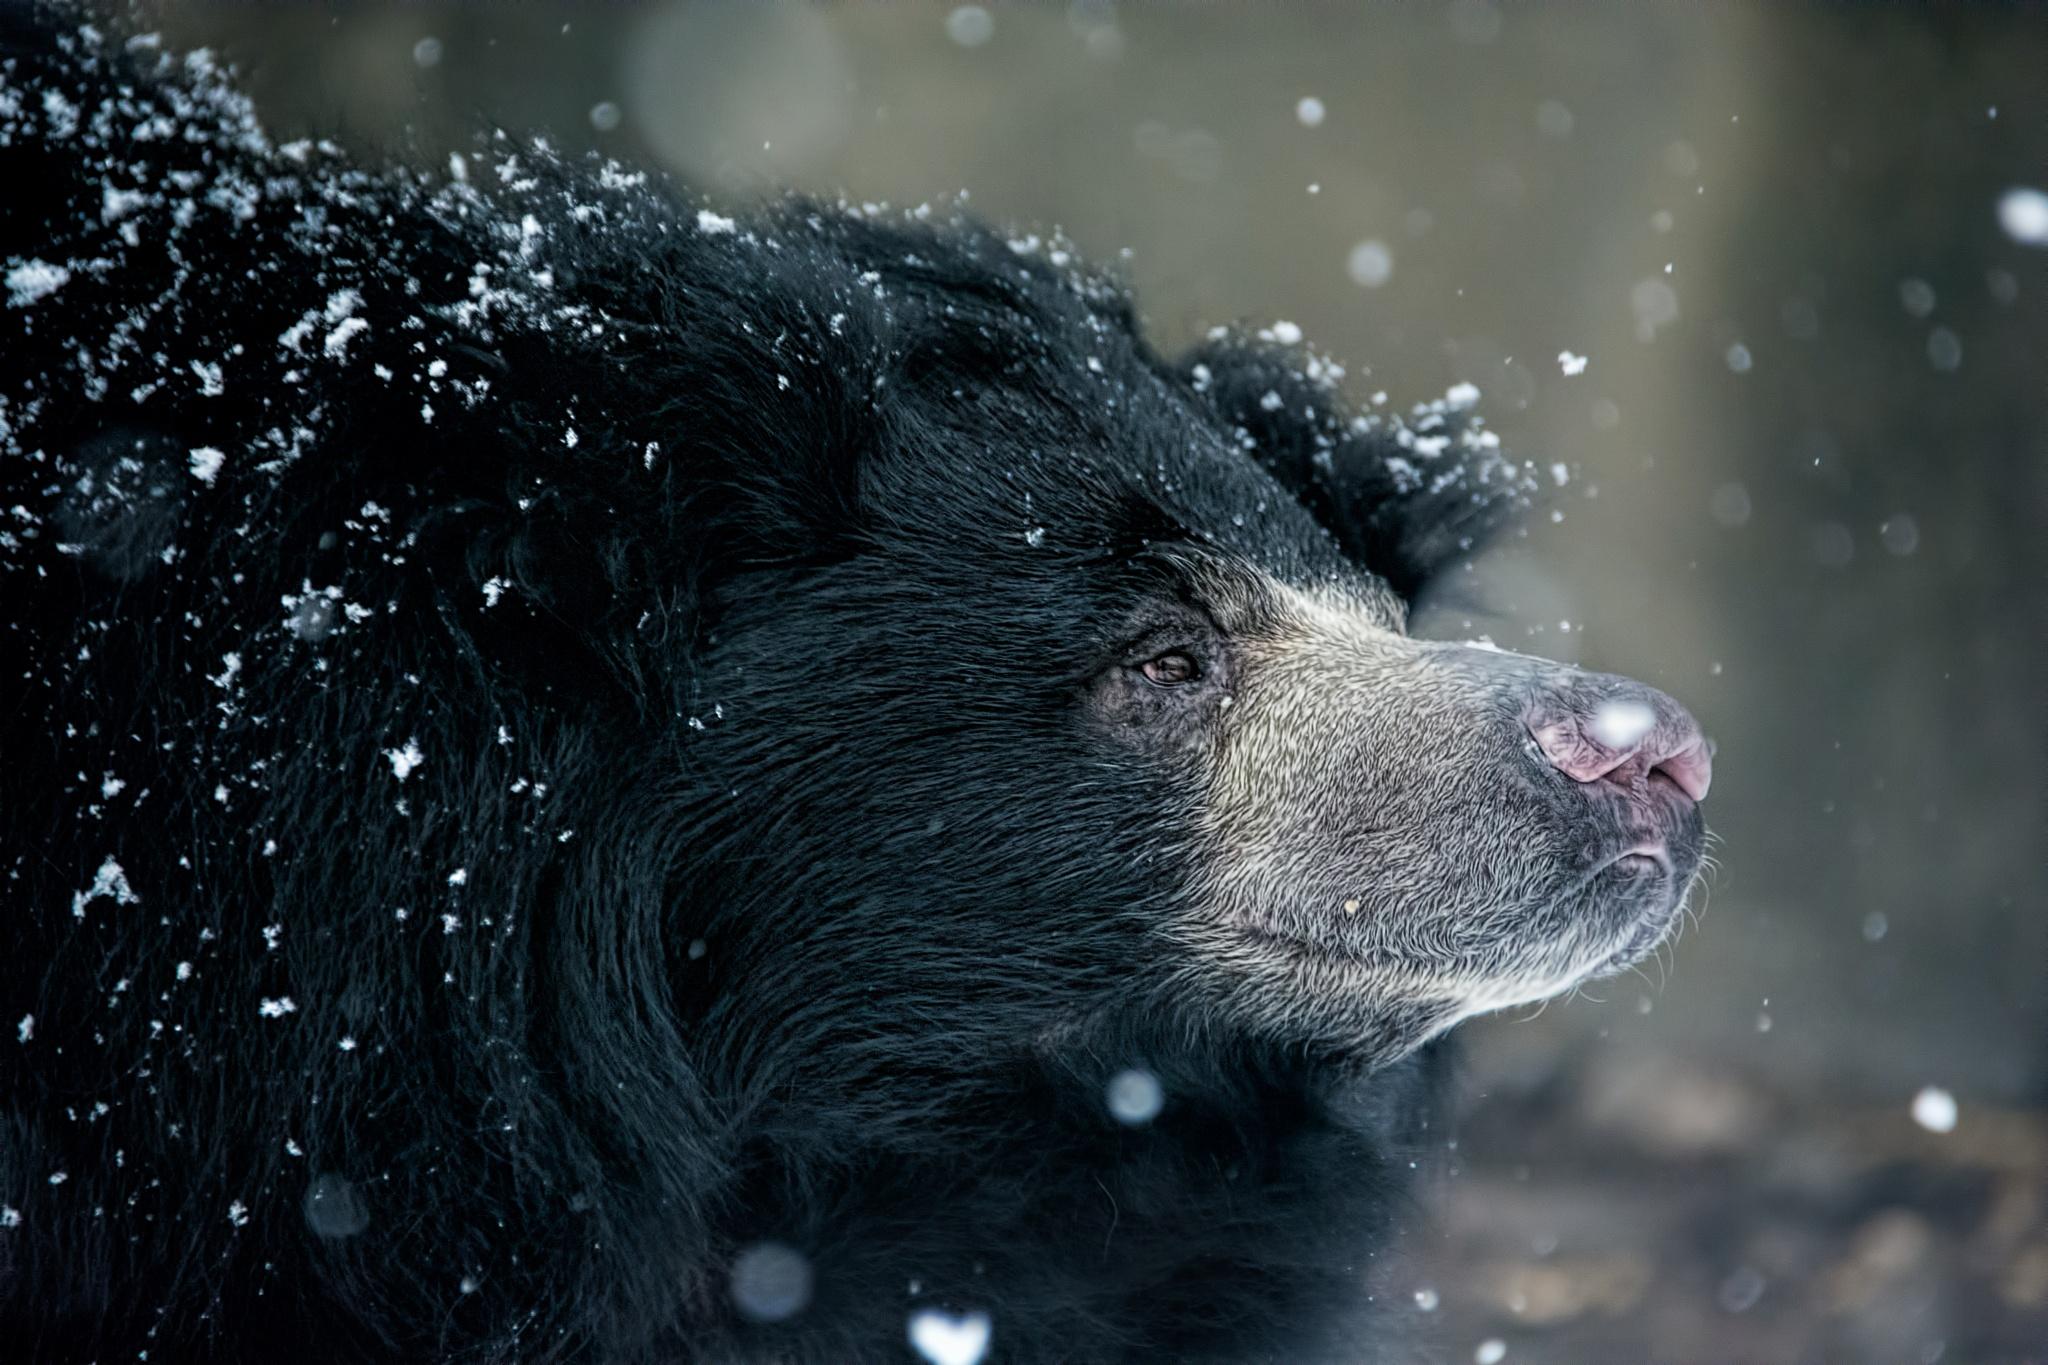 Sloth Bear by John Greg Jr